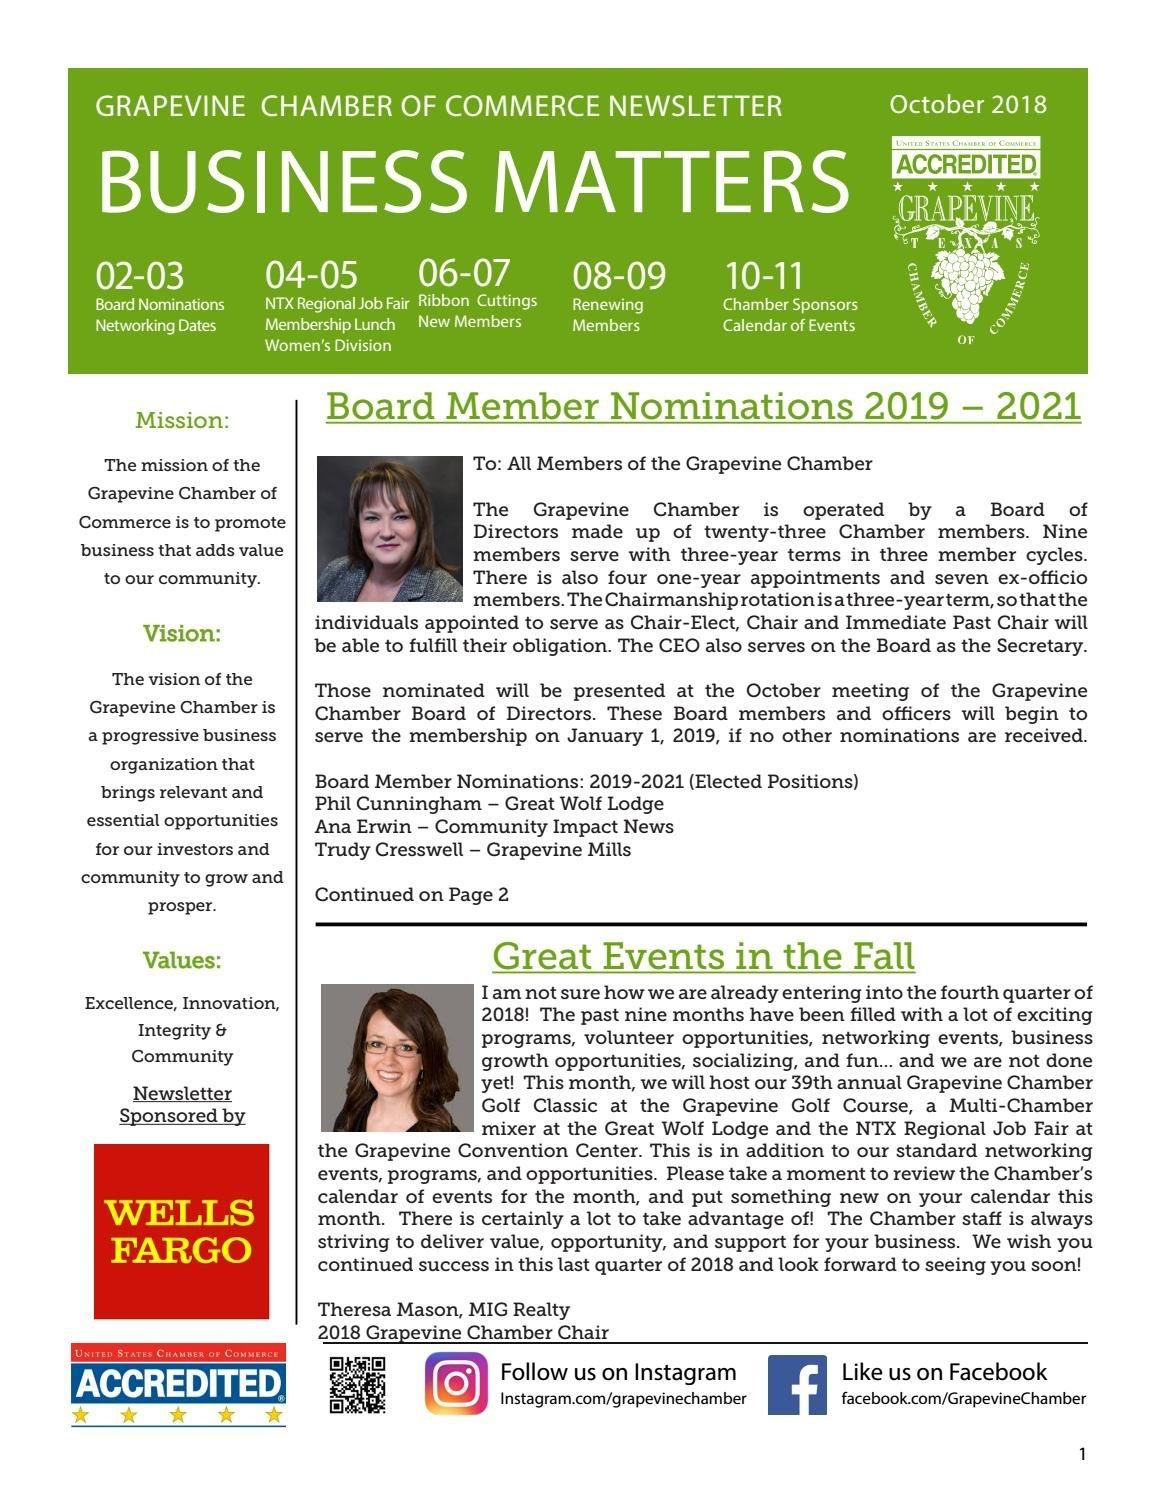 Grapevine Chamber Business Matters Newsletter October 2018